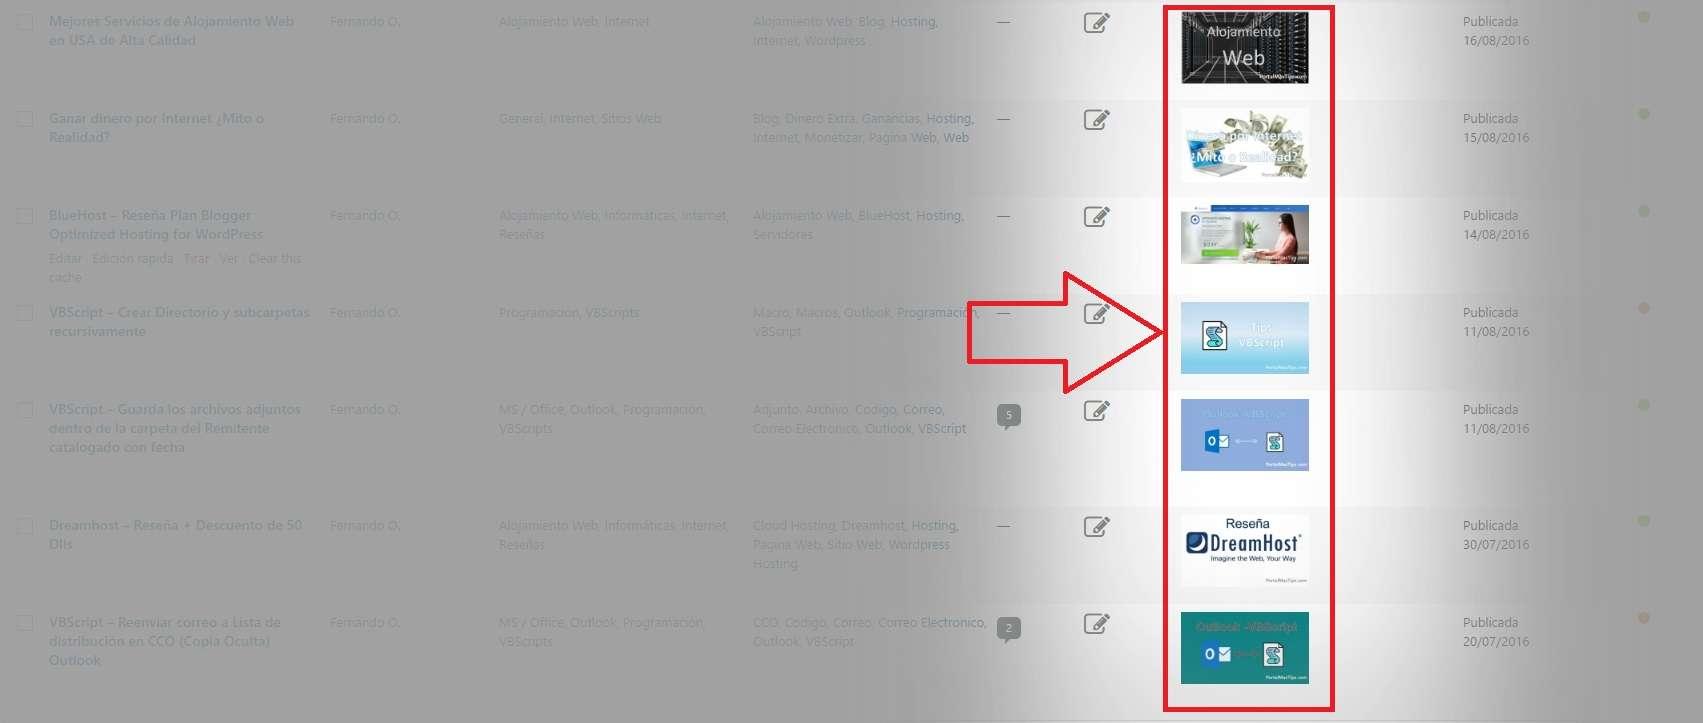 Wordpress - Agregar Columna de Imagen Destacada en listado de entradas 1